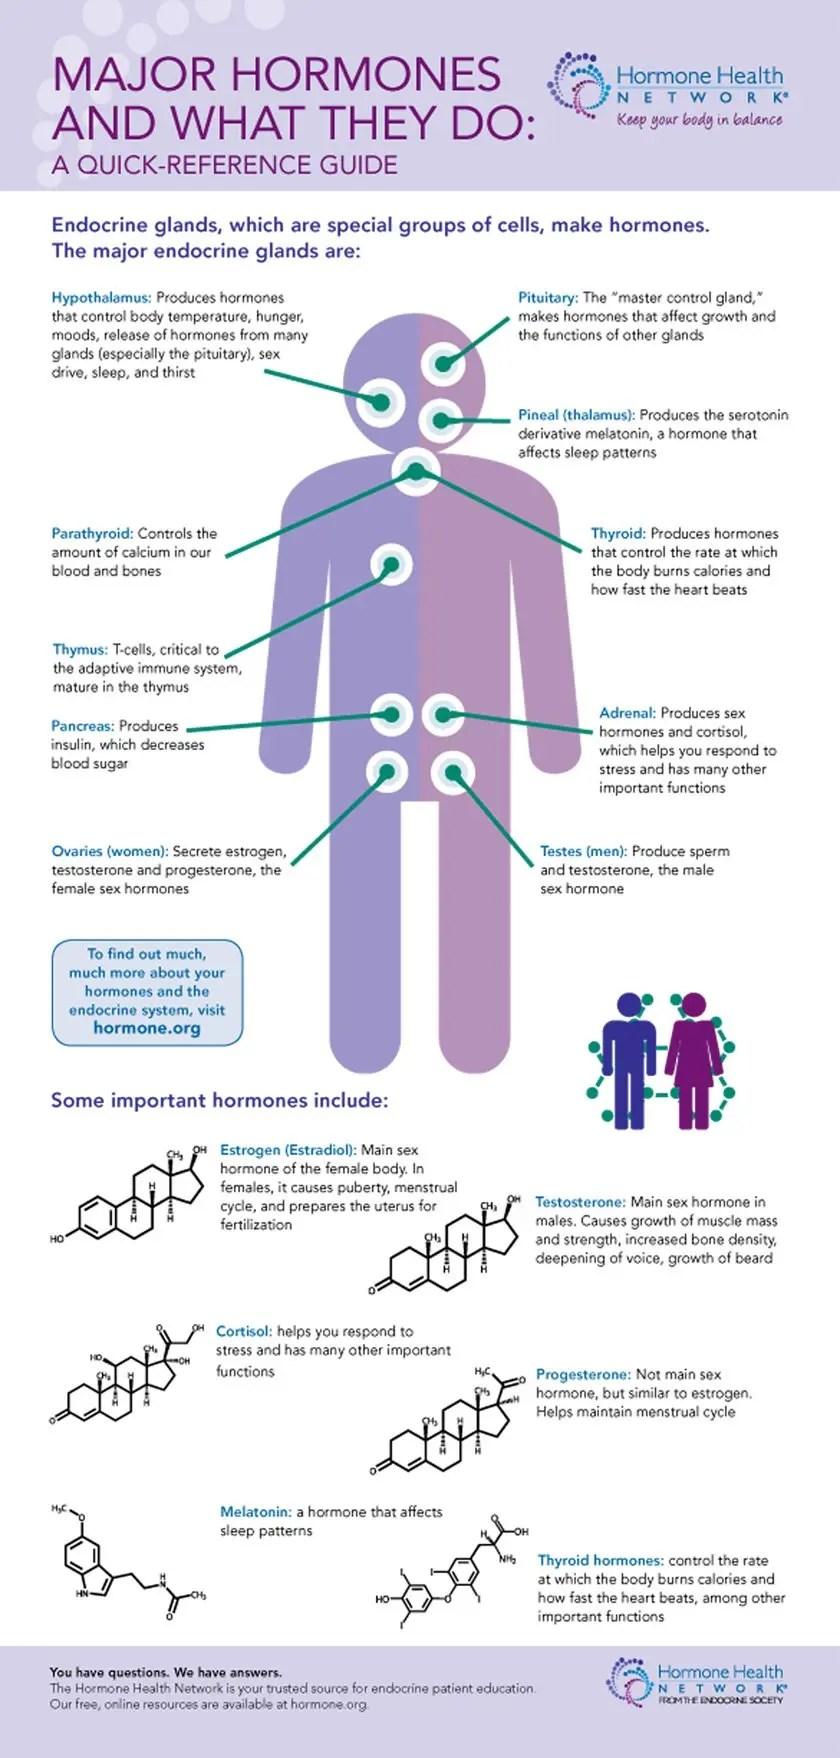 Major Endocrine Glands and Important Hormones